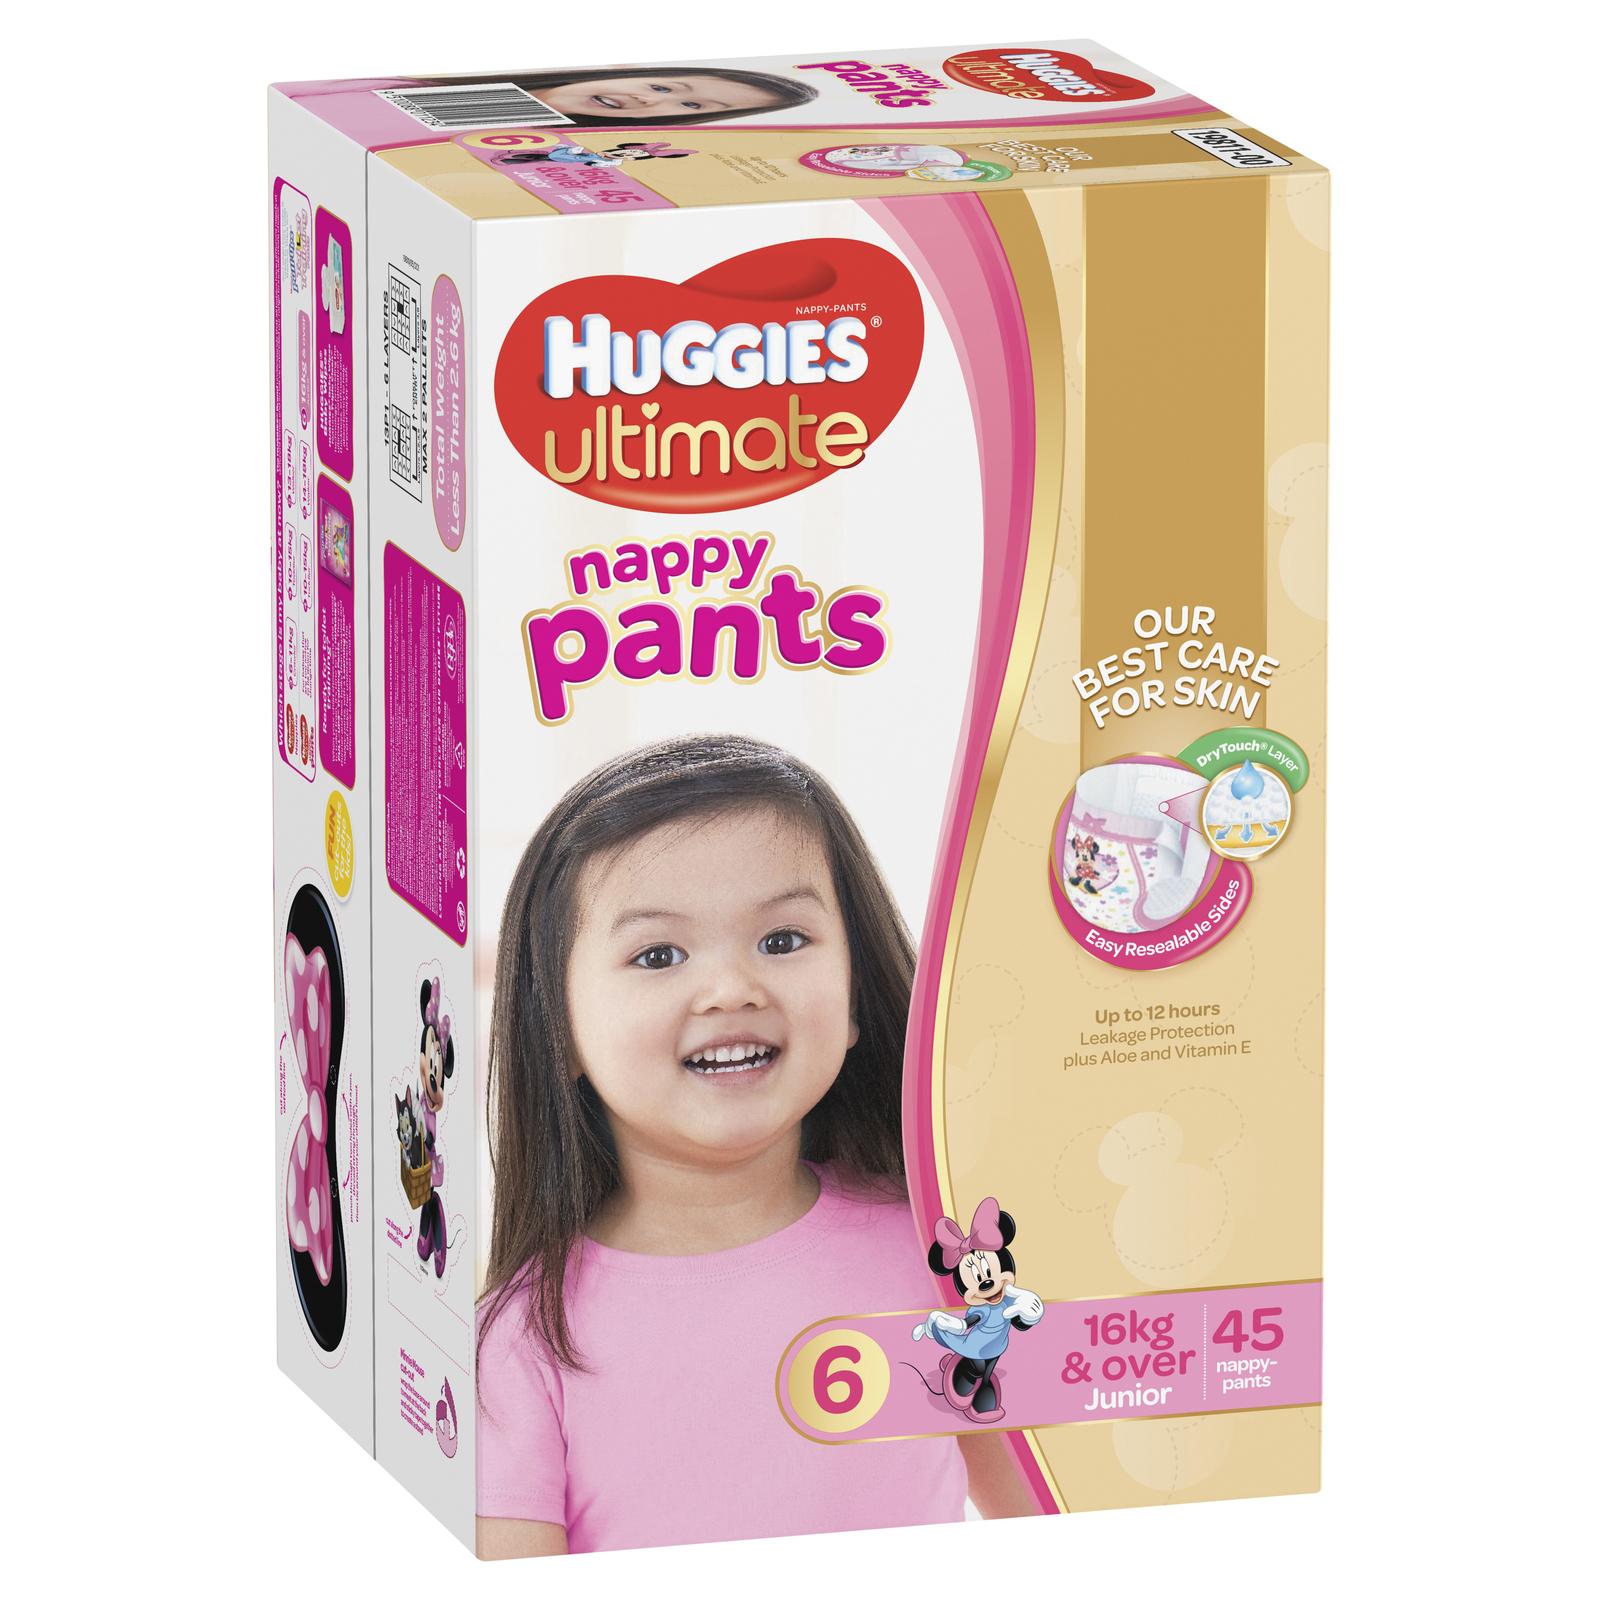 Huggies Ultimate Nappy Pants: Jumbo Pack - Junior Girl 16kg+ (45) image